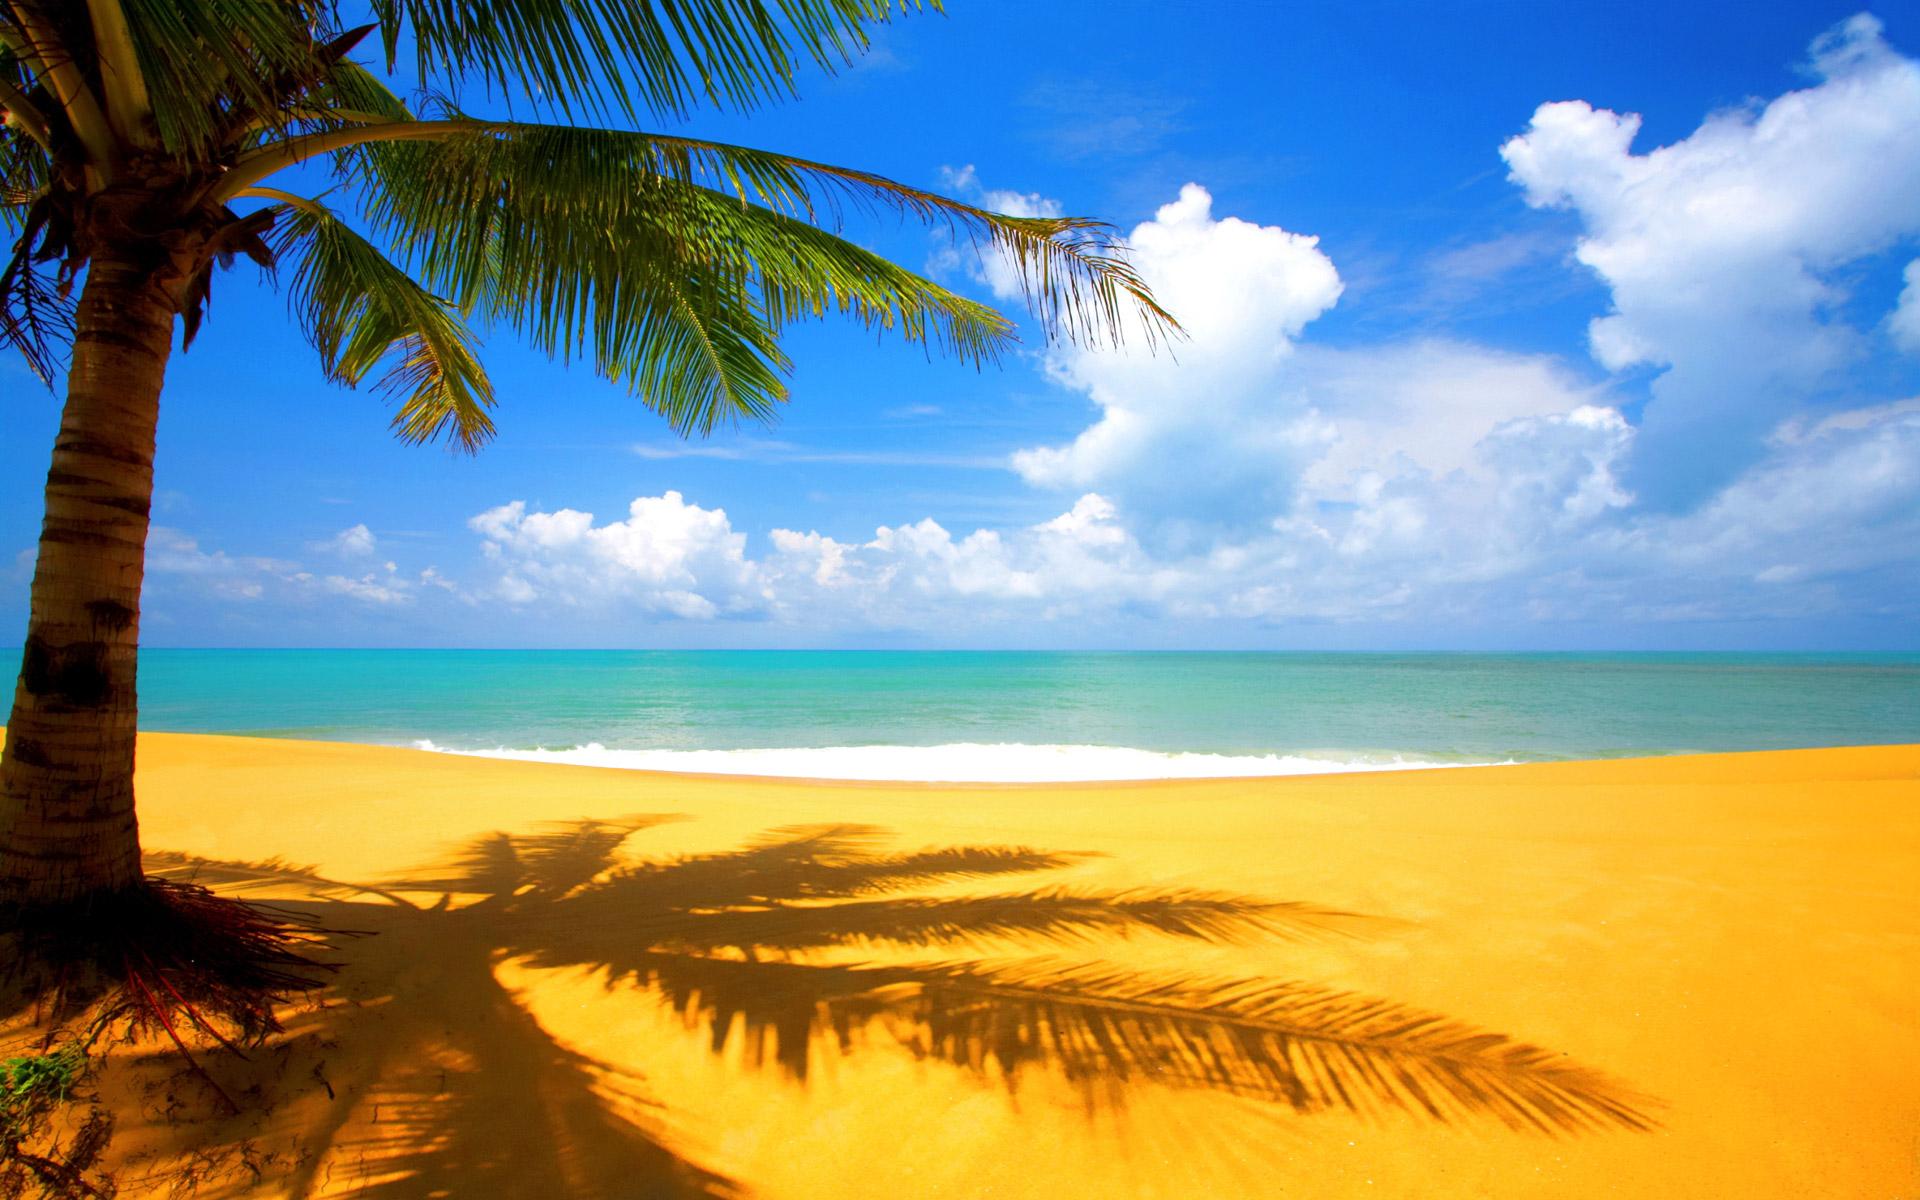 beach-nature-hd-wallpaper-wp423957-1